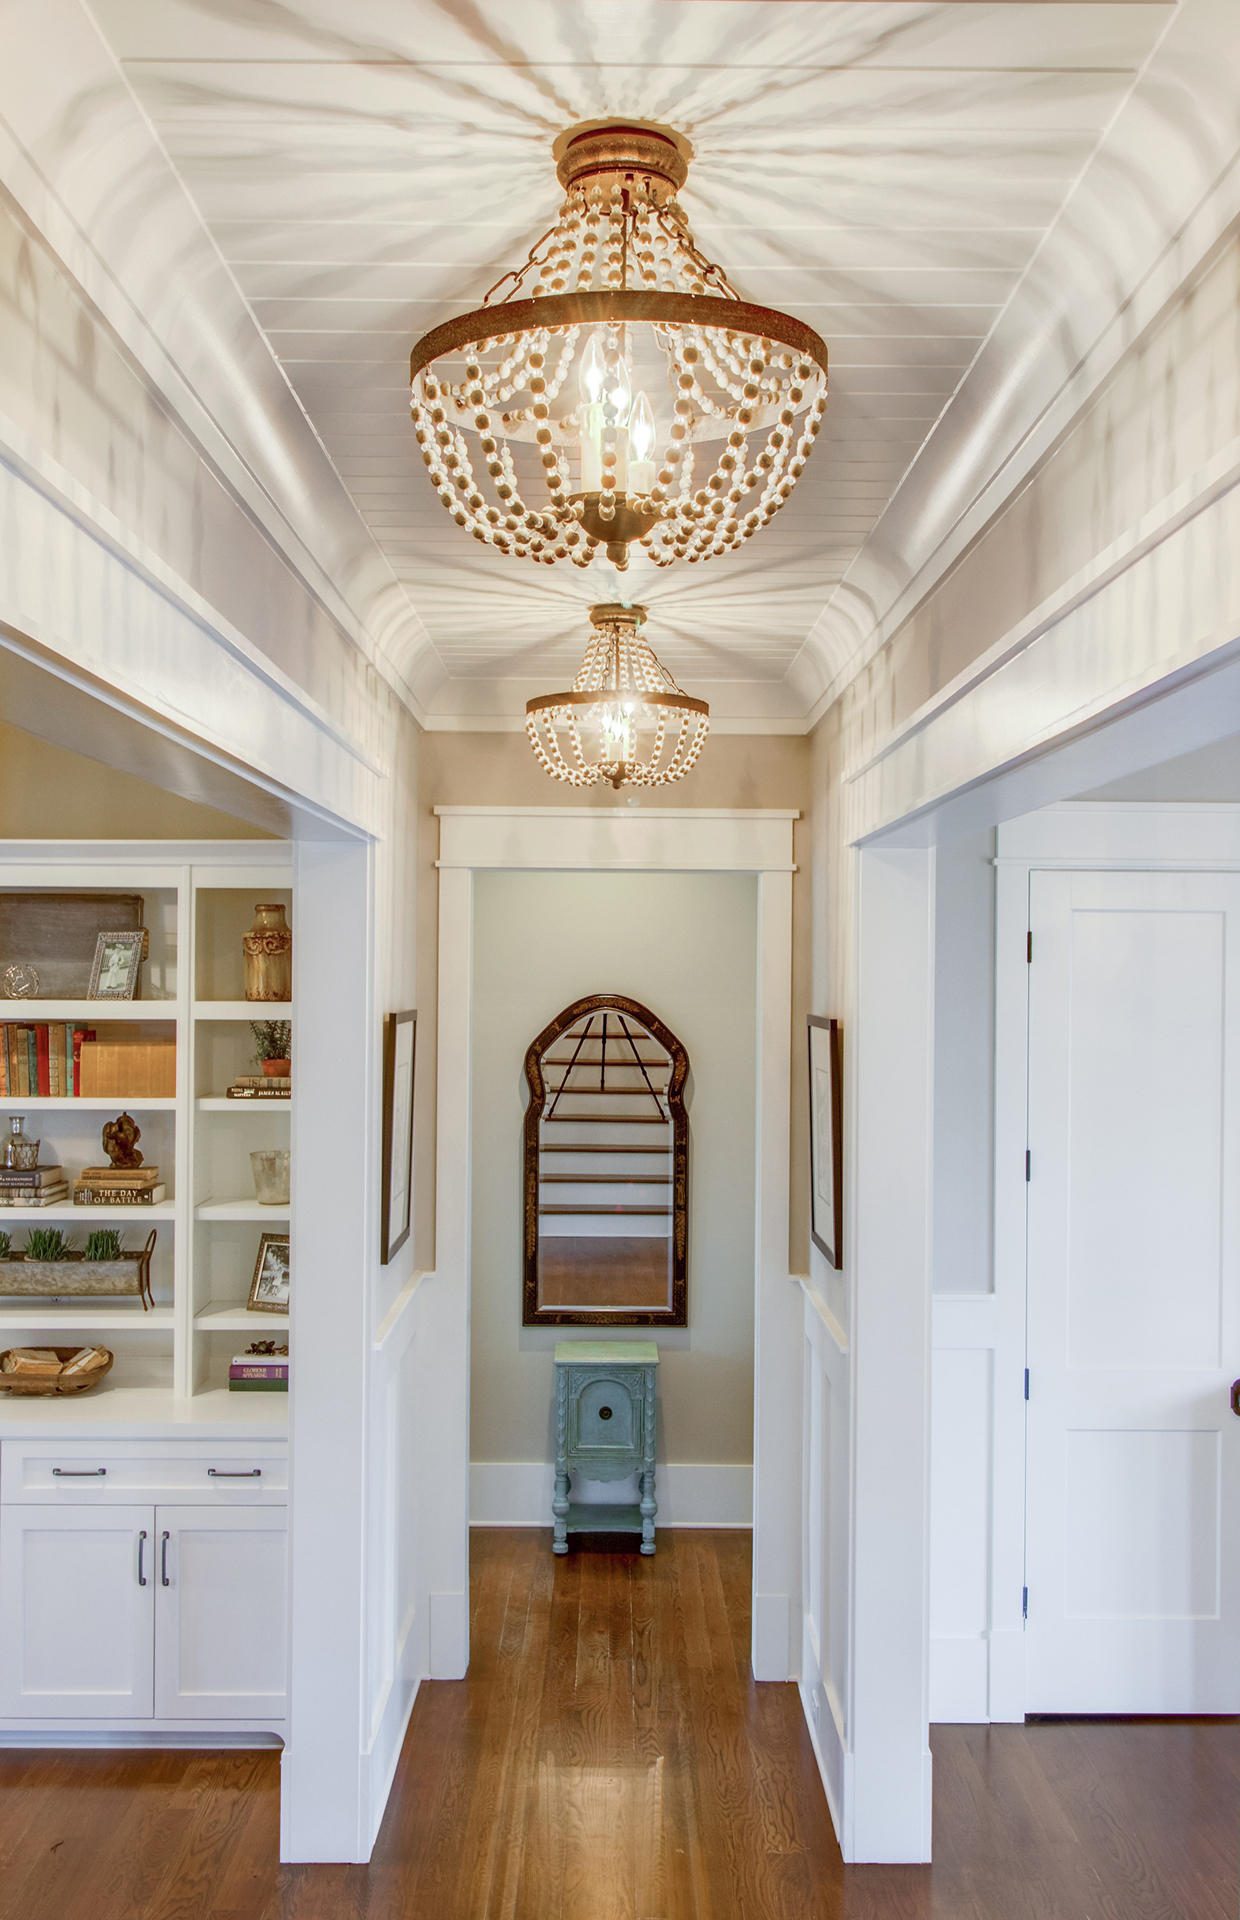 Daniel Island Park Homes For Sale - 117 Brailsford, Charleston, SC - 33